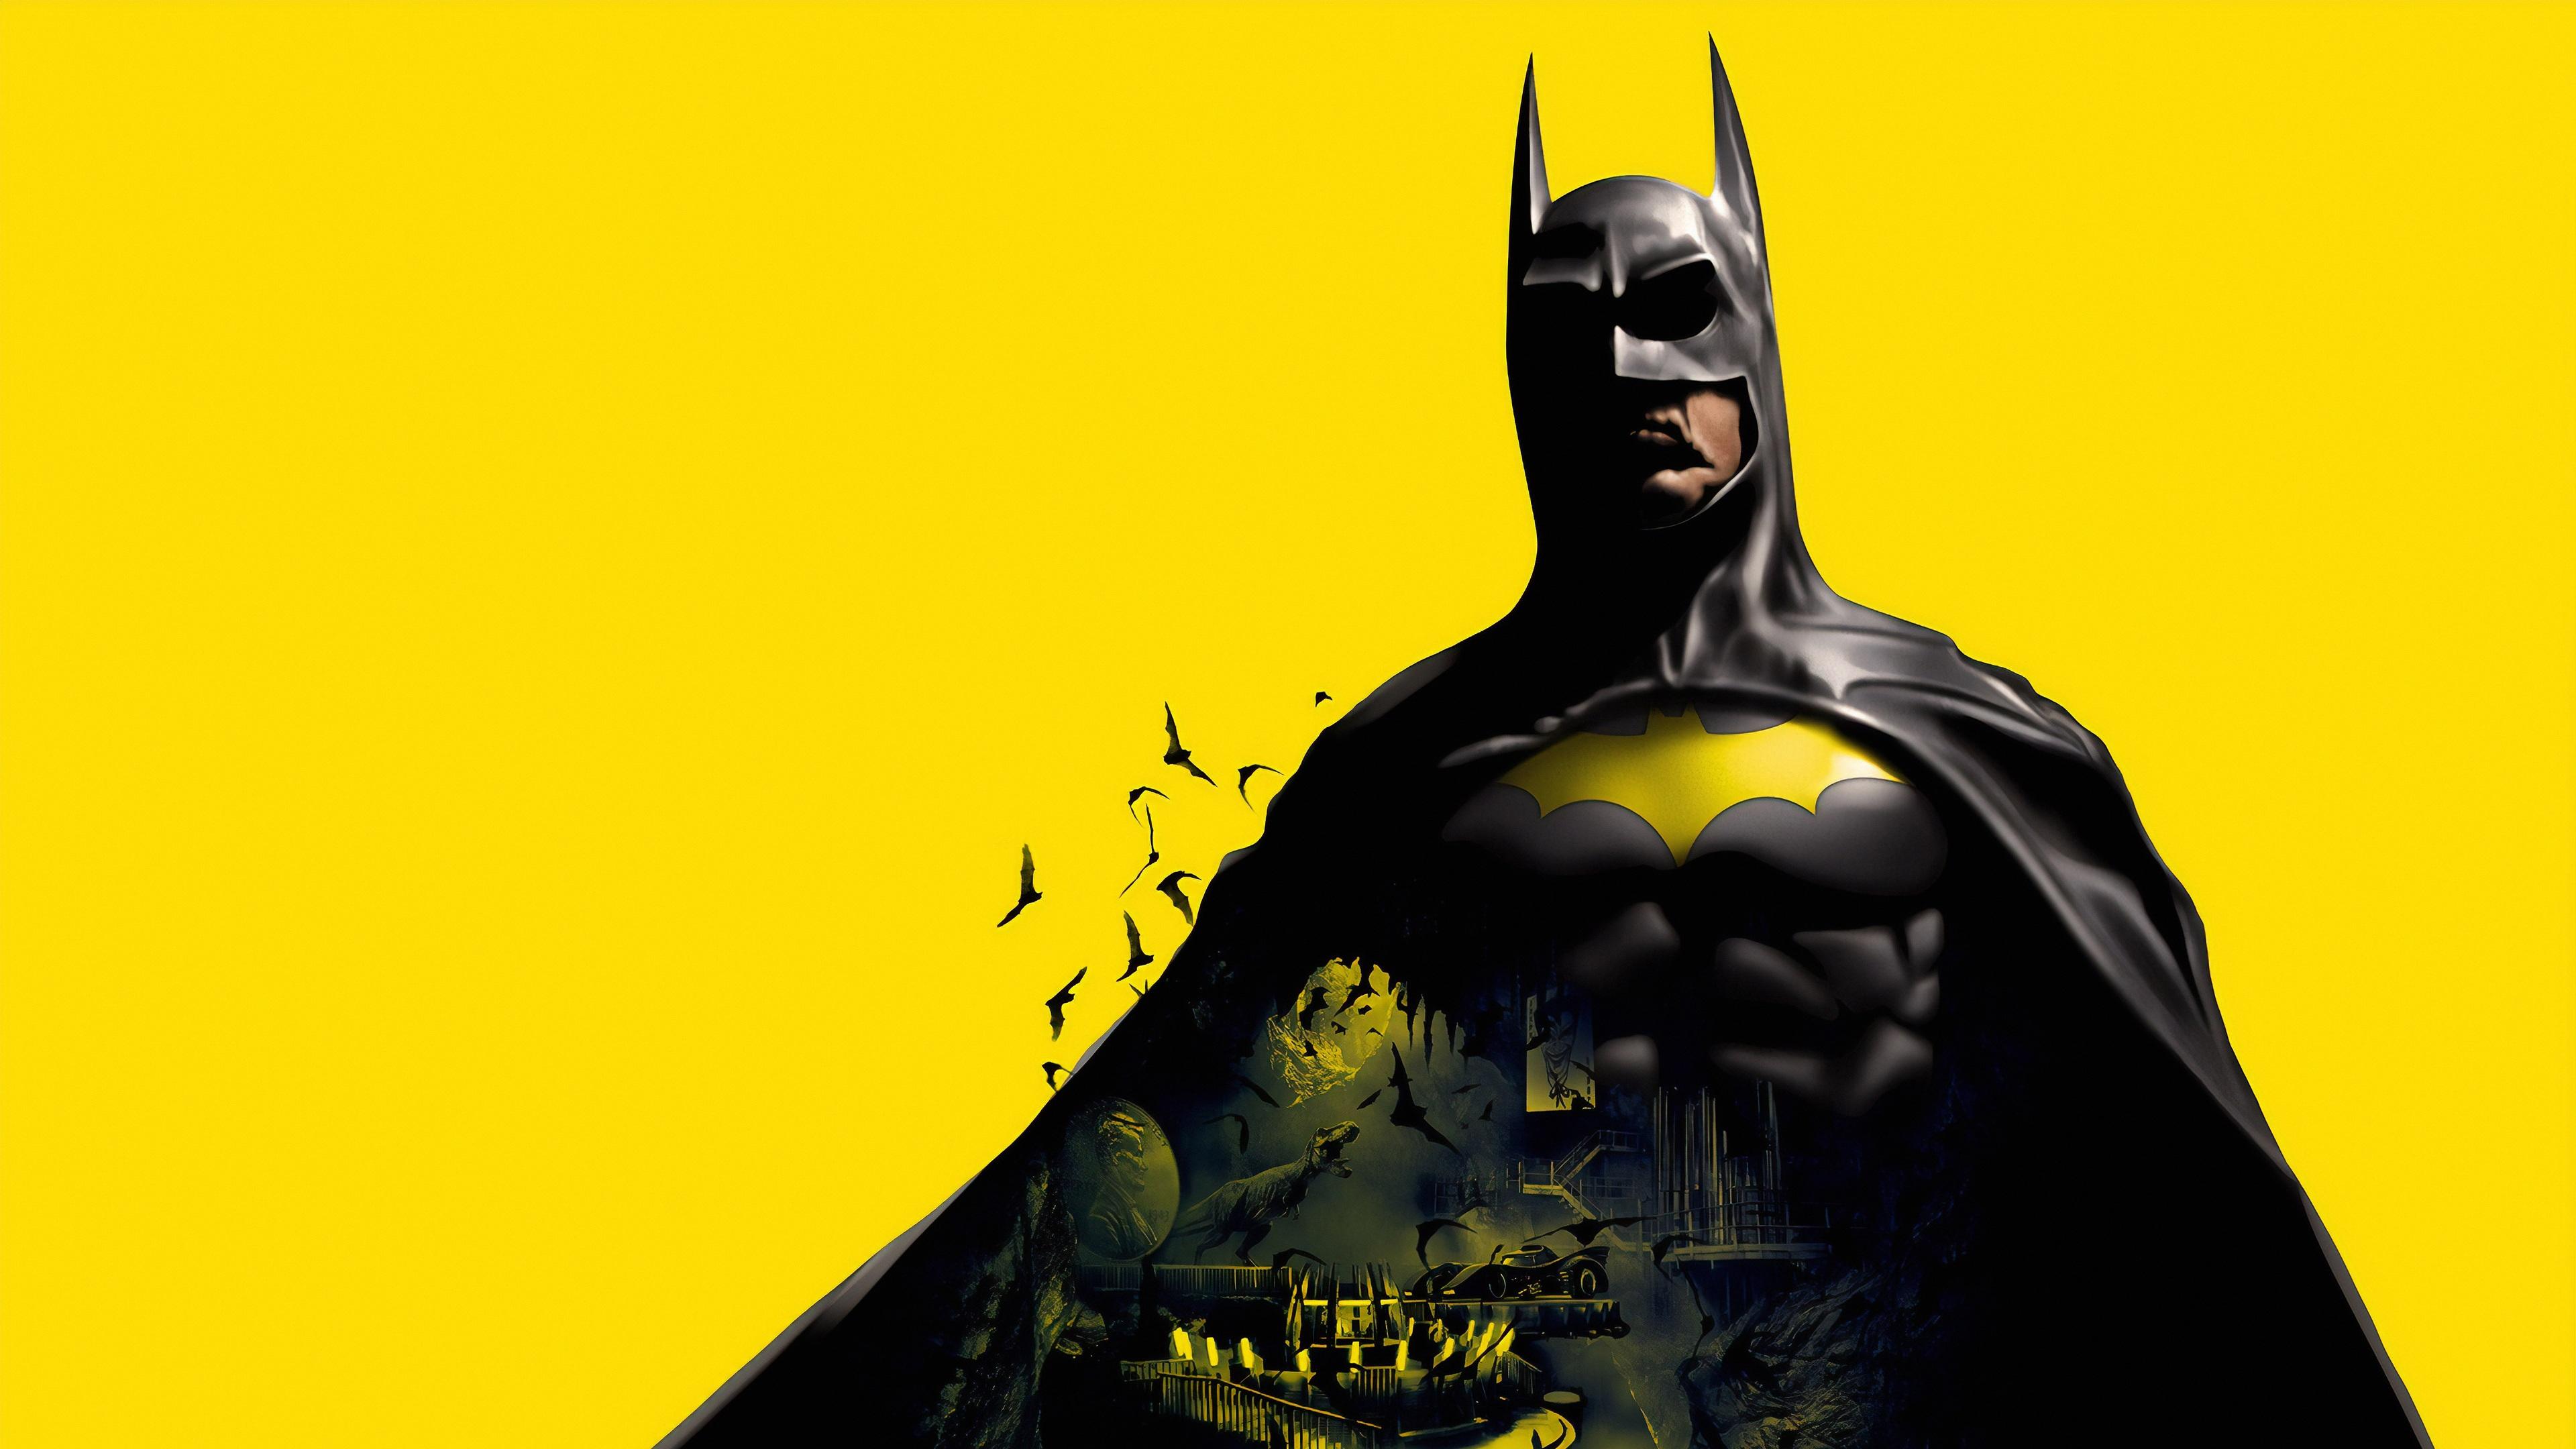 General 3840x2160 Batman artwork yellow background simple background bats Batcave DC Comics Batmobile